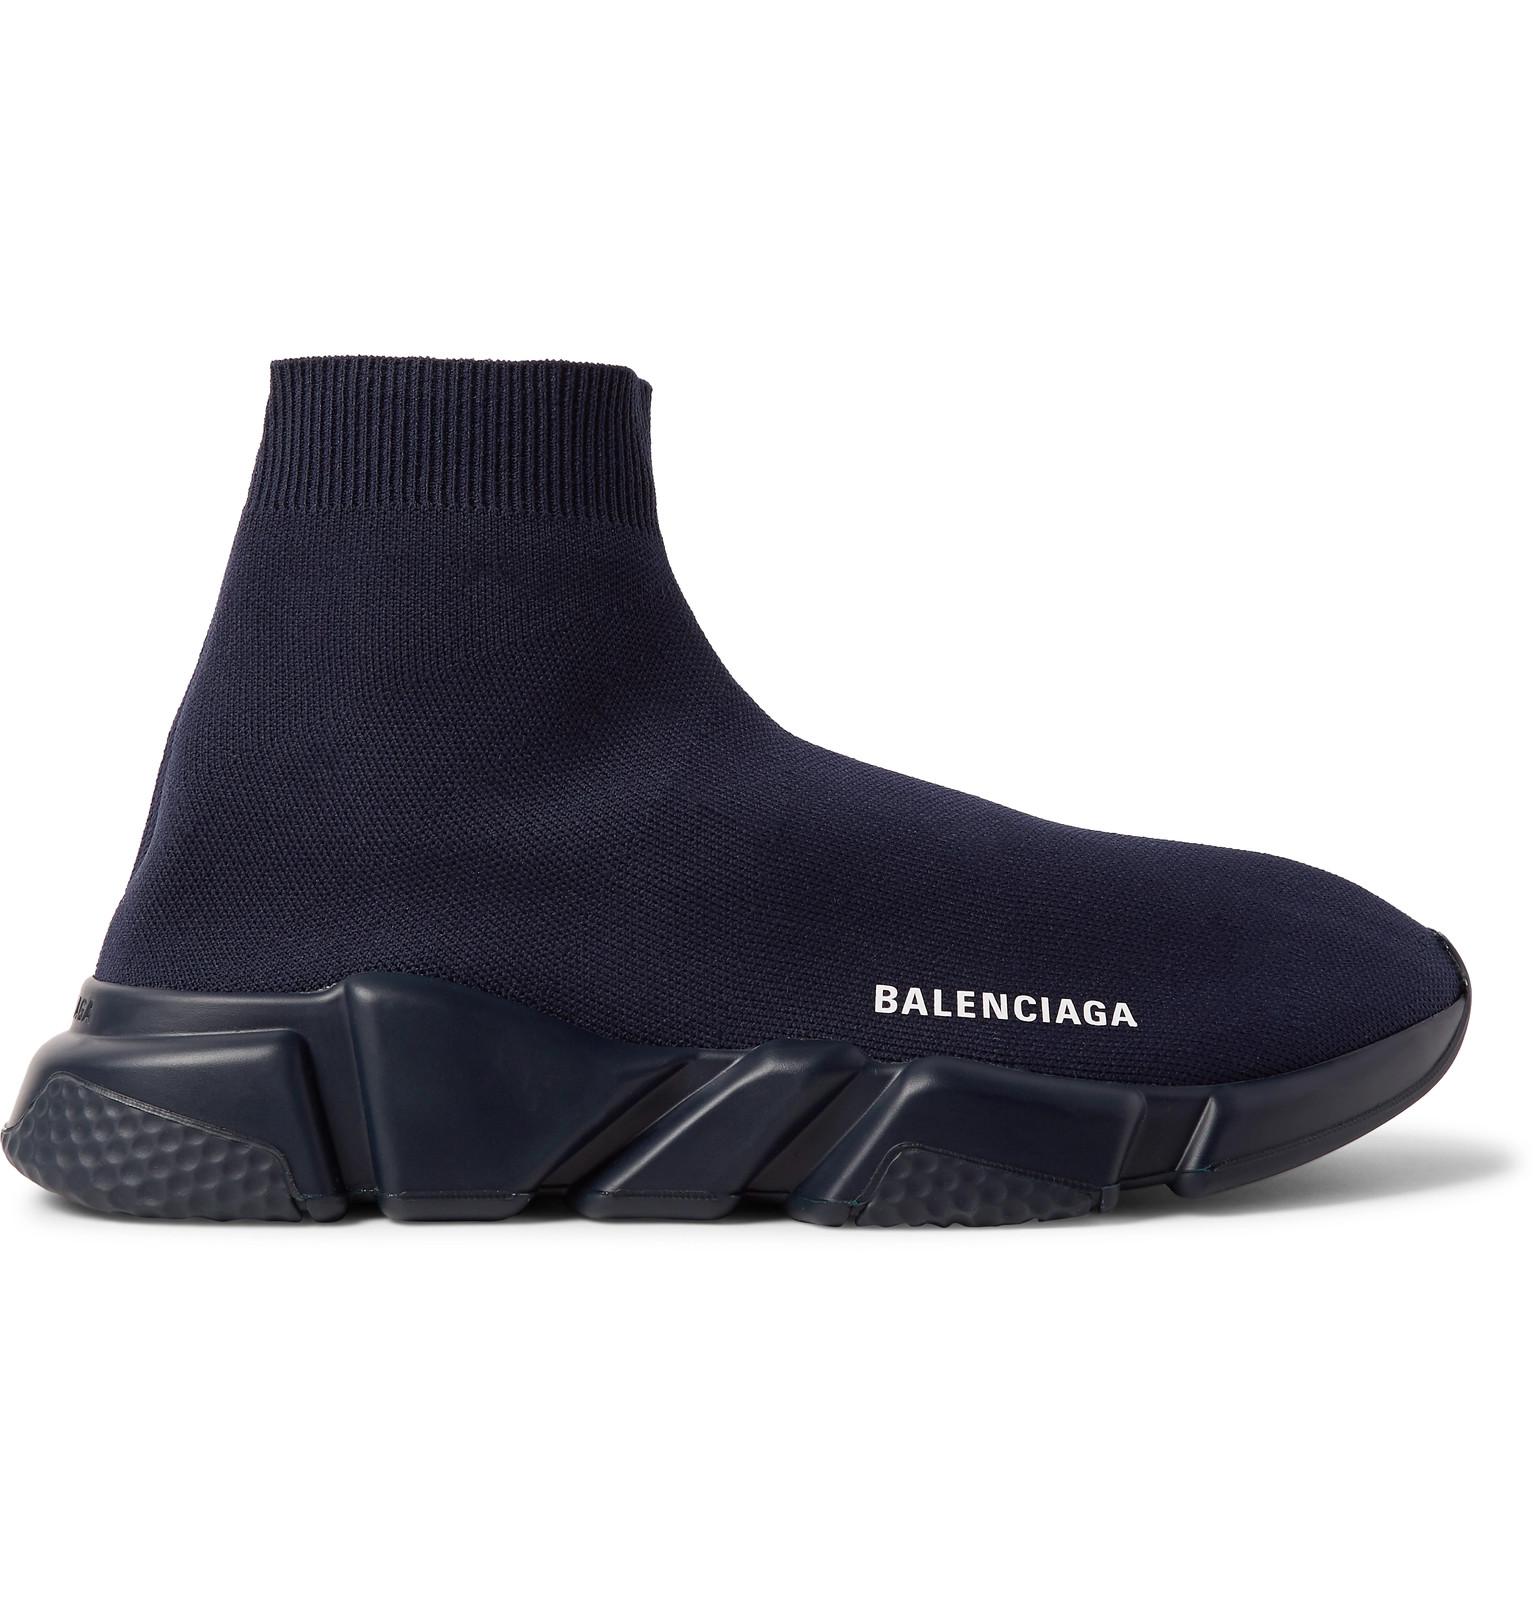 4c1f18f06dd6 Balenciaga - Speed Sock Stretch-Knit Slip-On Sneakers